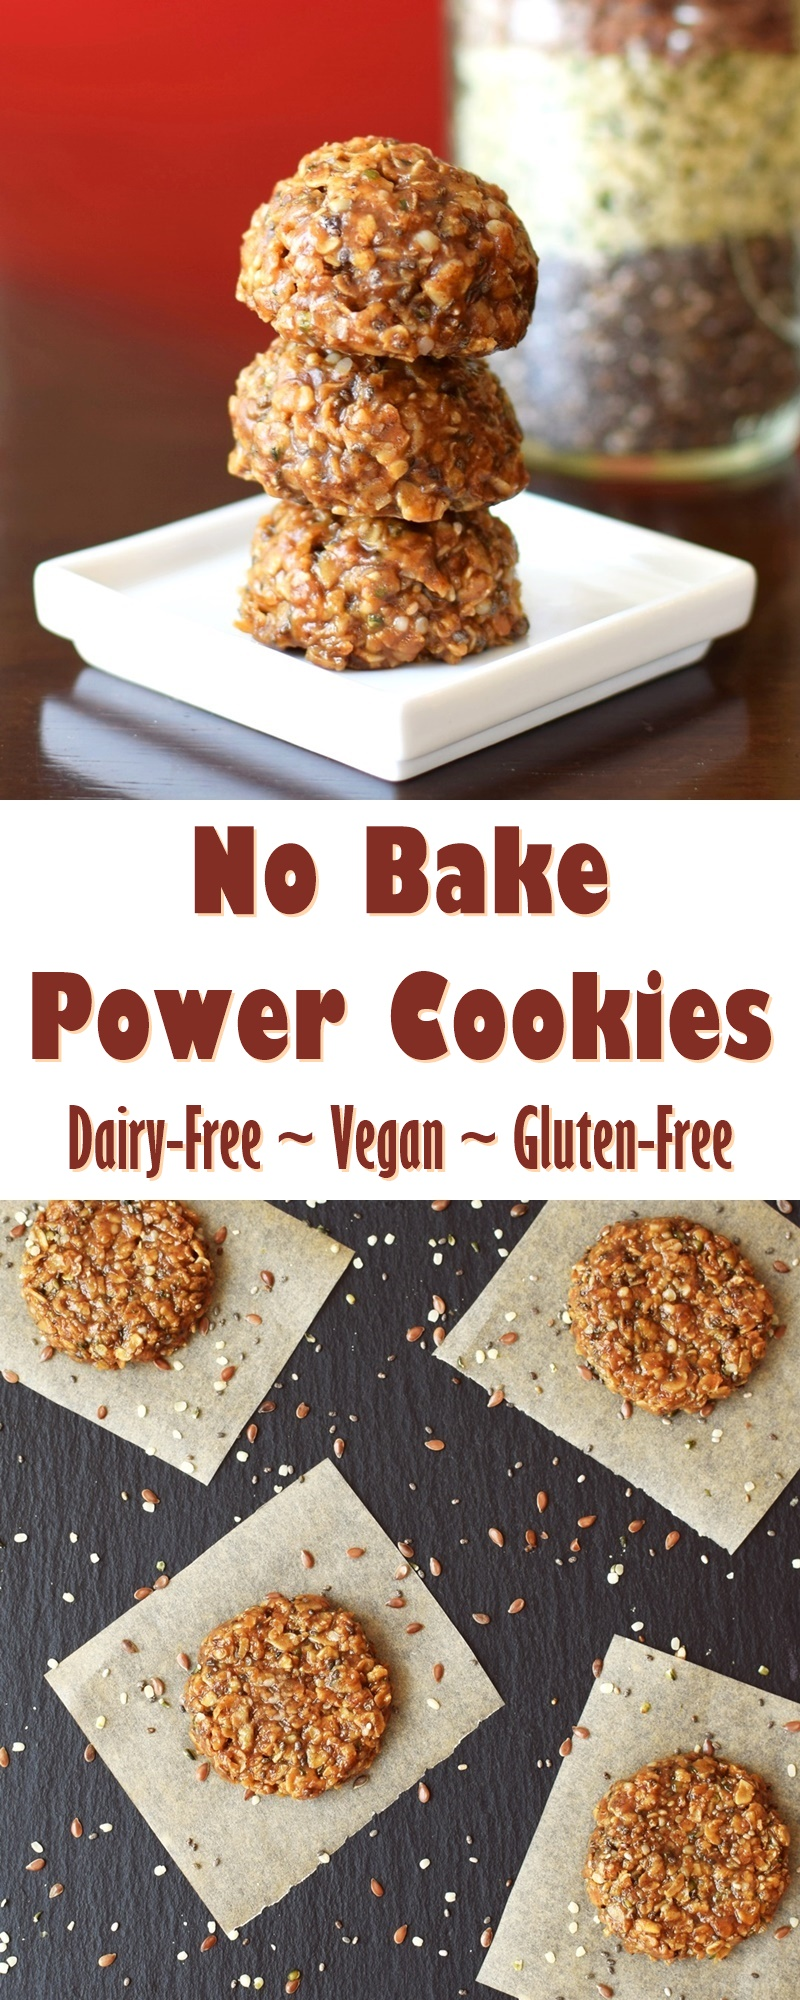 No Bake Power Cookies Recipe - rich in healthy vegan, gluten-free, dairy-free ingredients (freezer-friendly!)